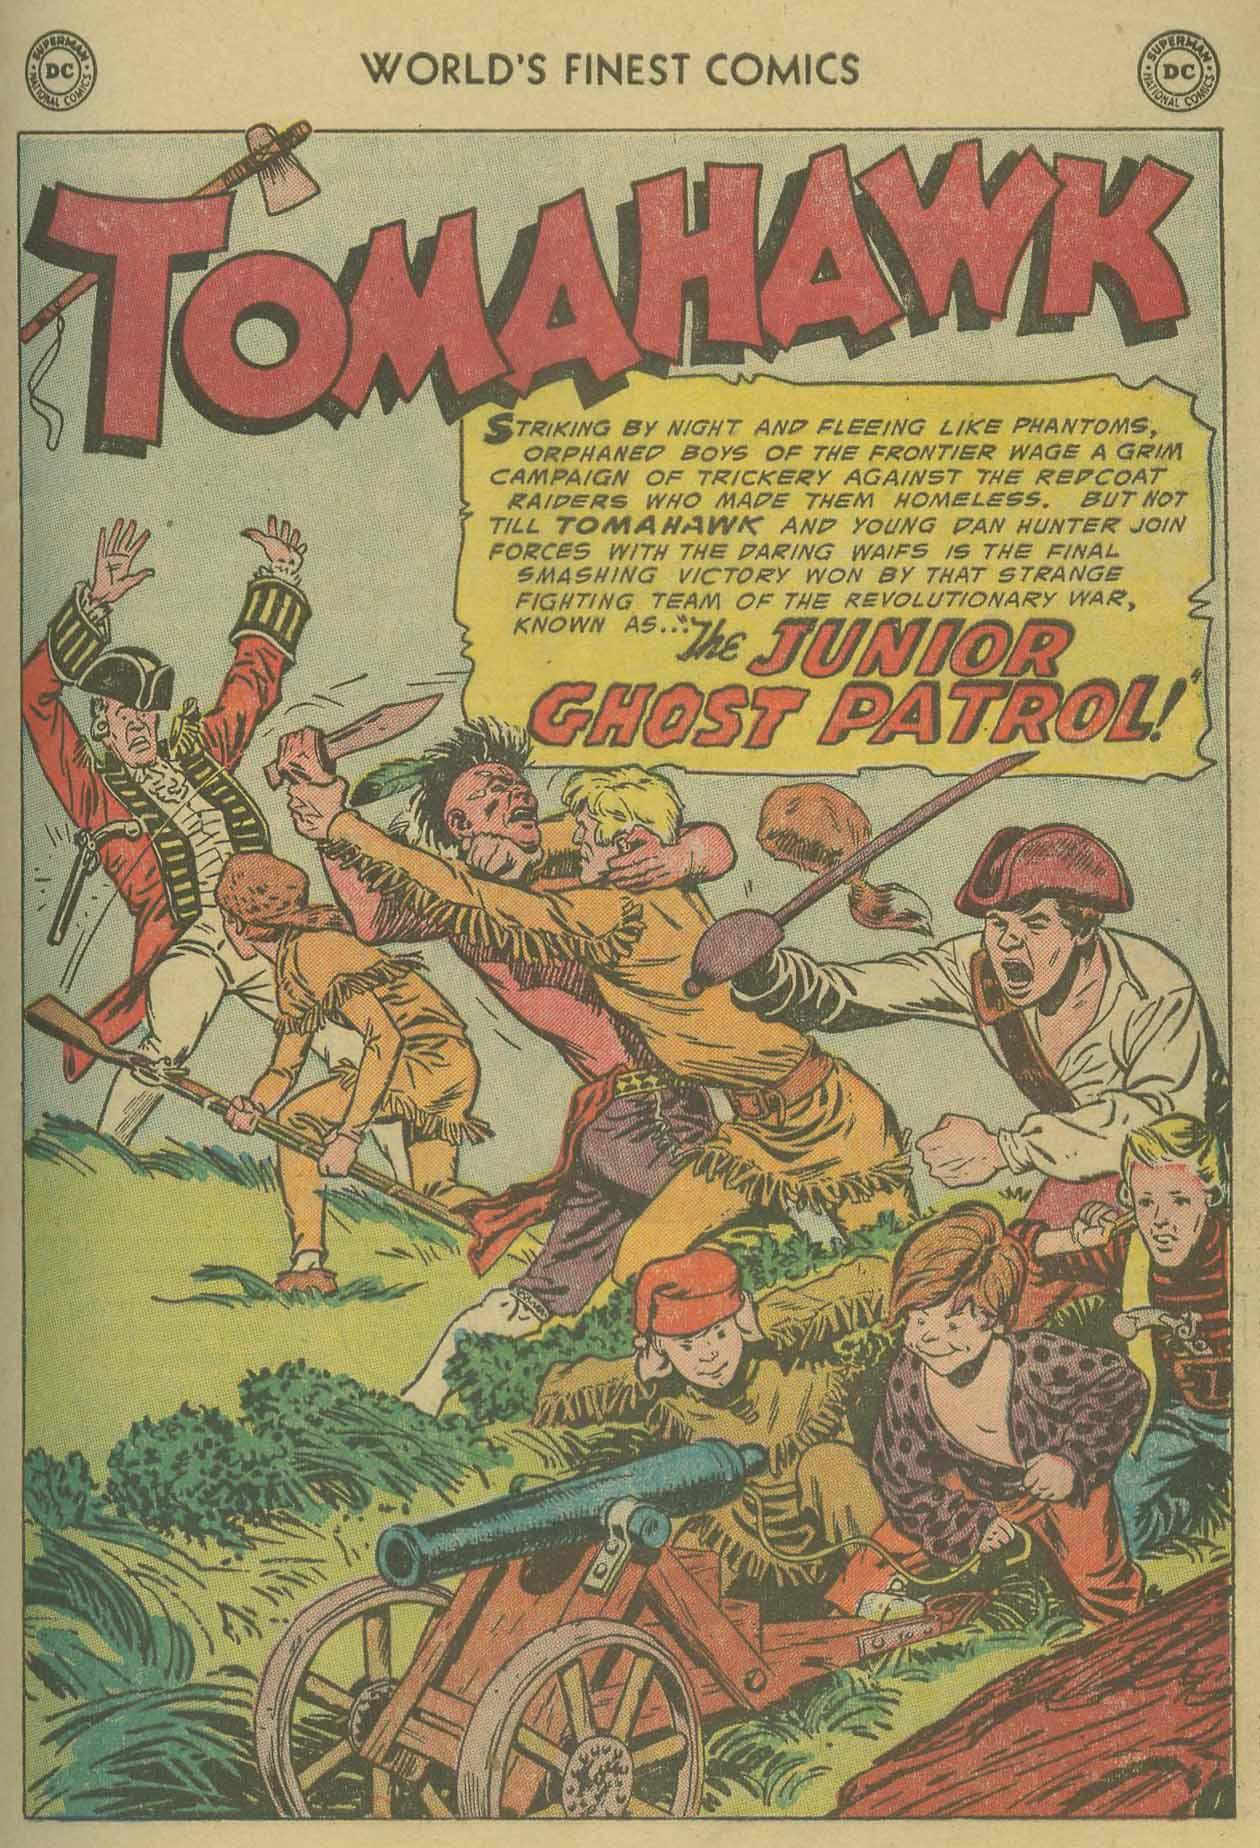 Read online World's Finest Comics comic -  Issue #69 - 17